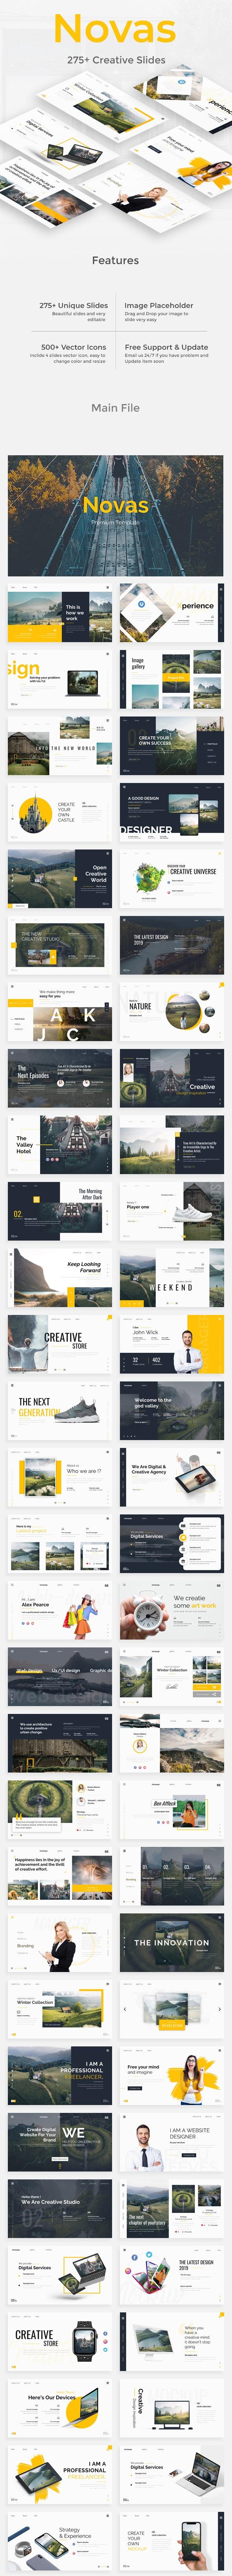 Novas Premium Keynote Template - Creative Keynote Templates